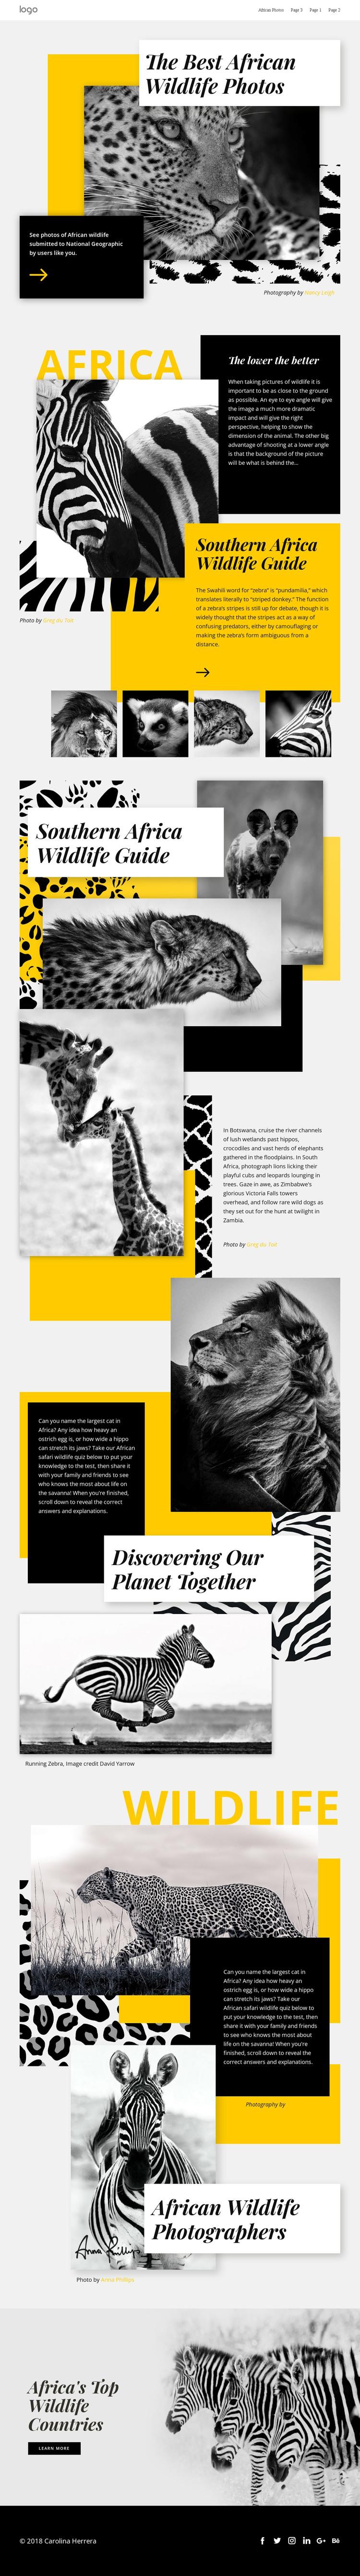 Best African Photos WordPress Theme